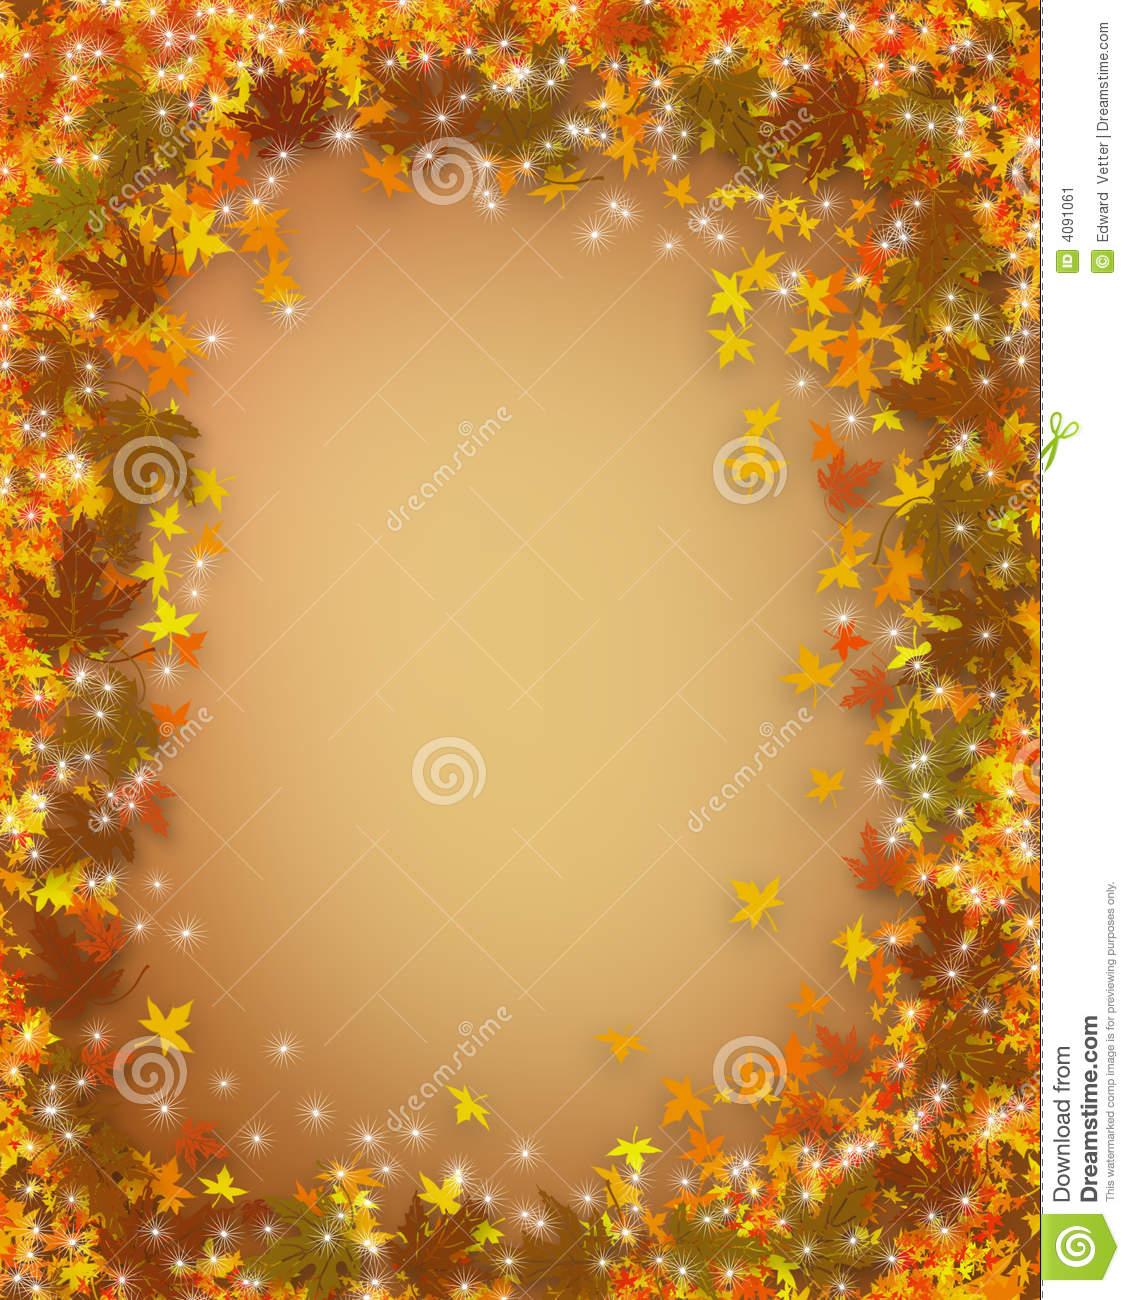 thanksgiving fall autumn border stock illustration - illustration of